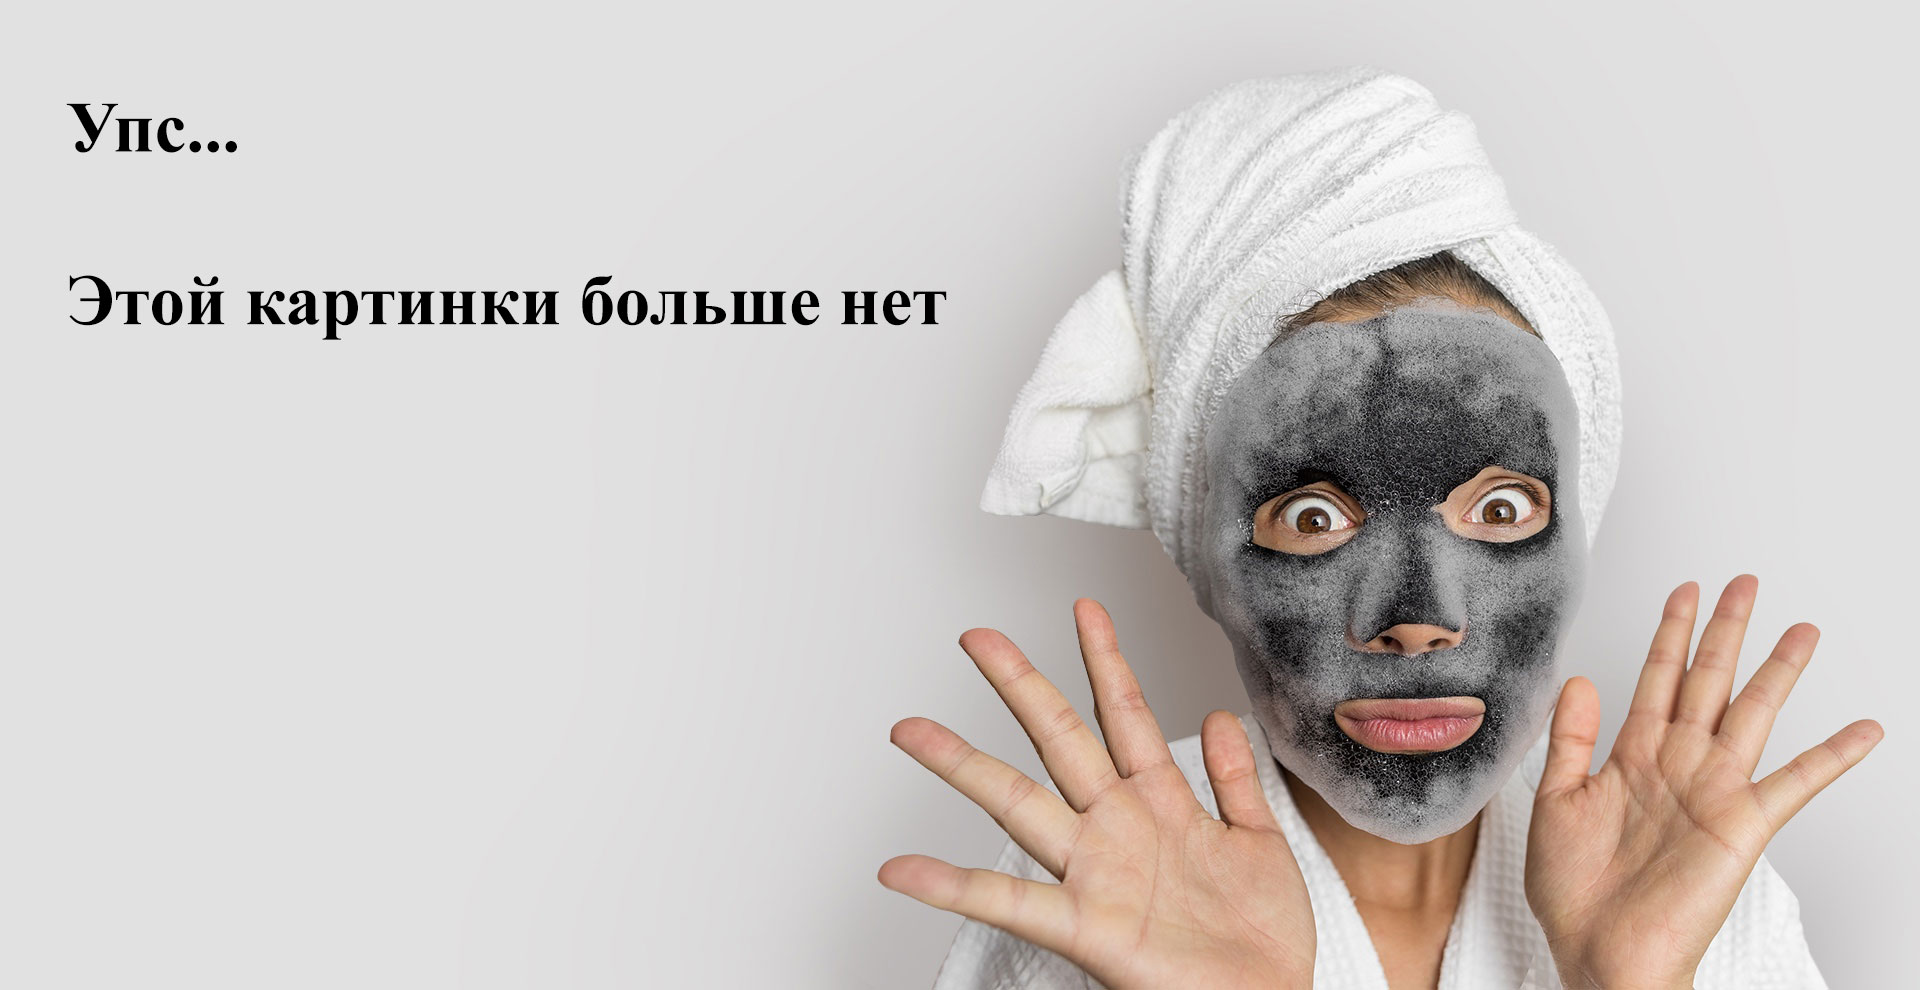 Dolce Vita, Ресницы в баночке DV Extension Deluxe Premium 0,15/10, изгиб B натуральный